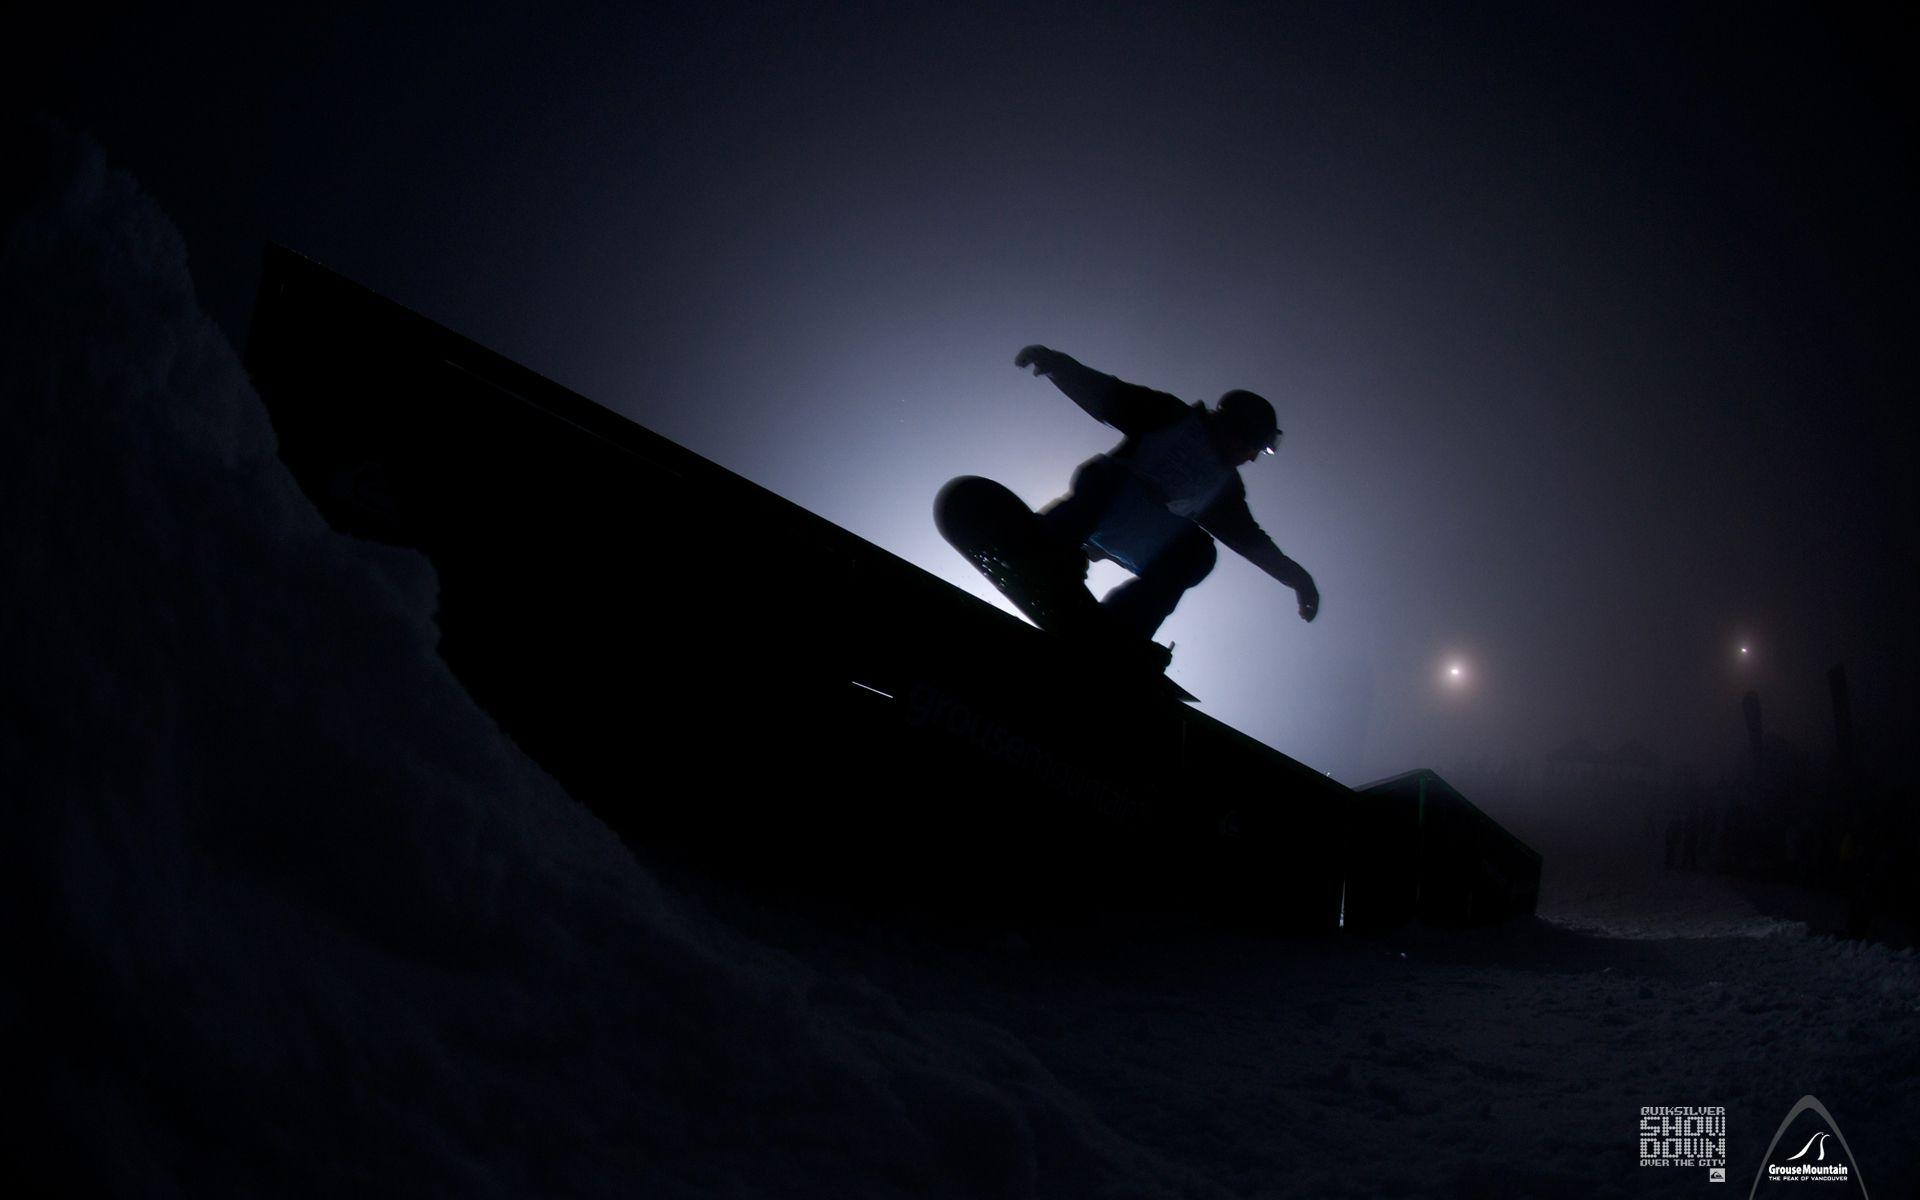 snowboarding wallpapers wallpaper - photo #42